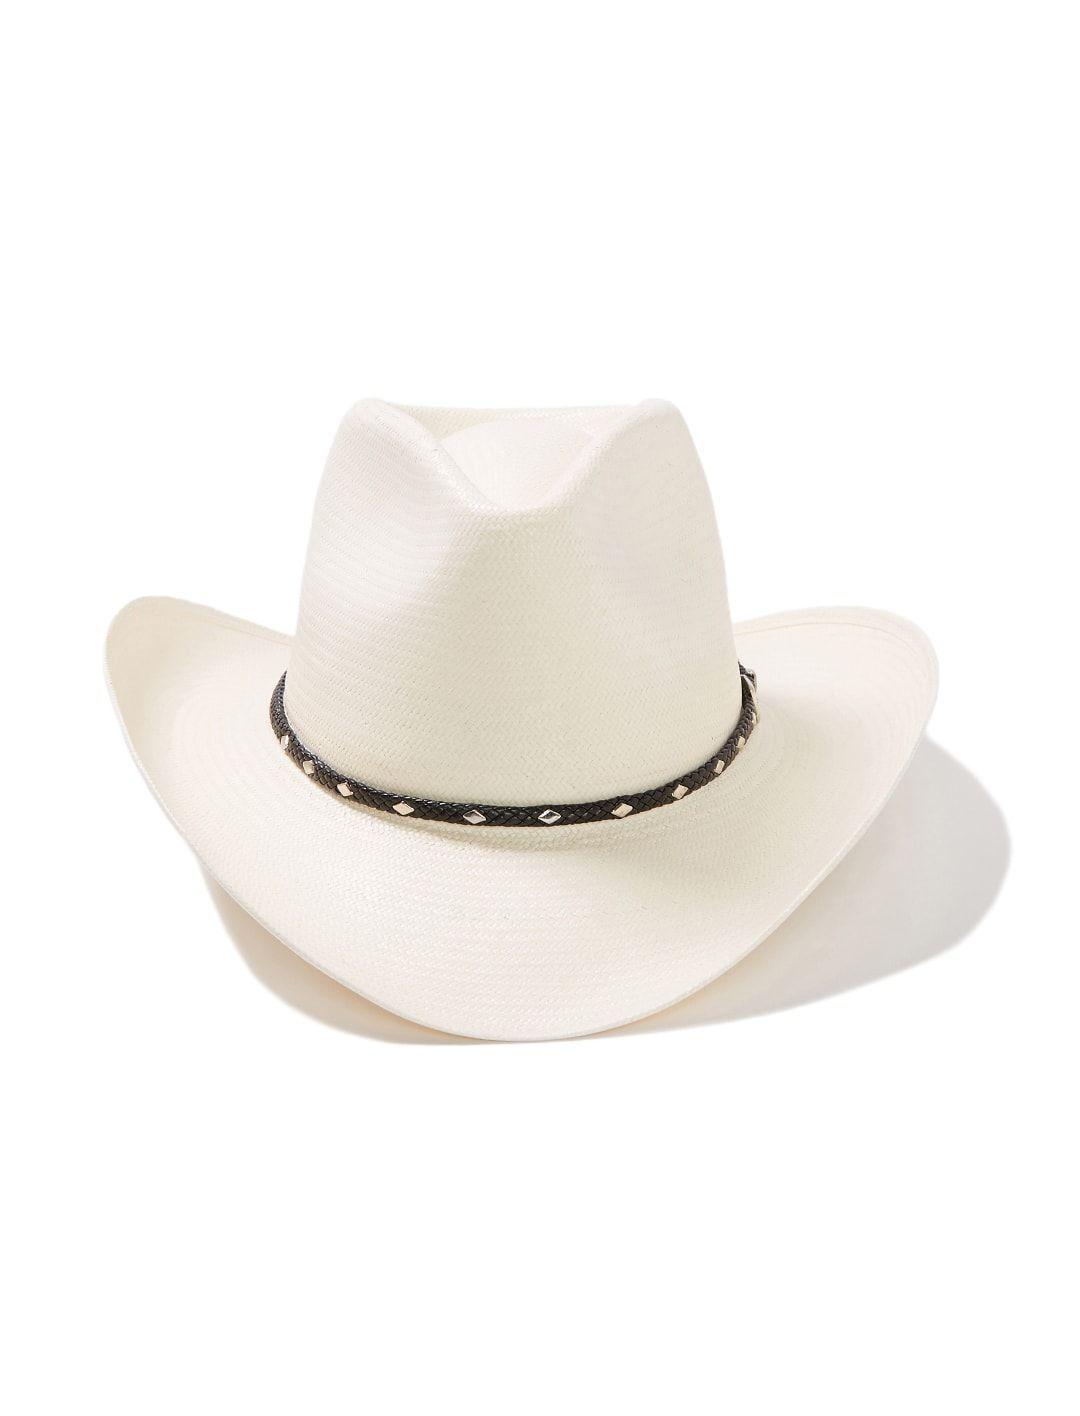 Stetson Diamond Jim 8X Straw Cowboy Hat Sombreros Stetson 7b9ee66bf3b